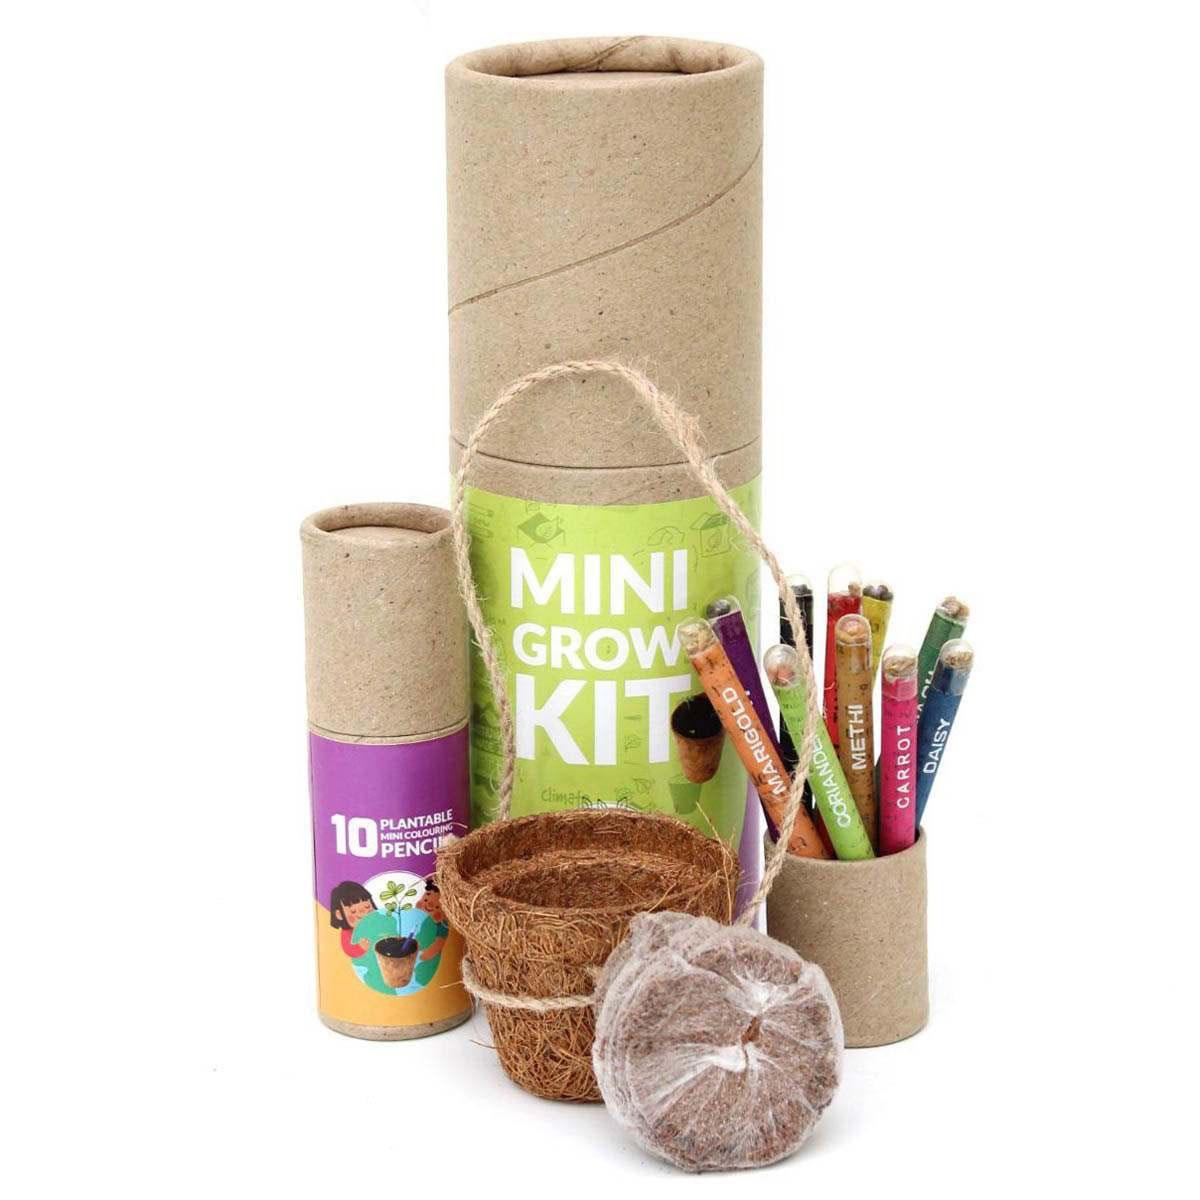 Plantable Mini Grow Kit